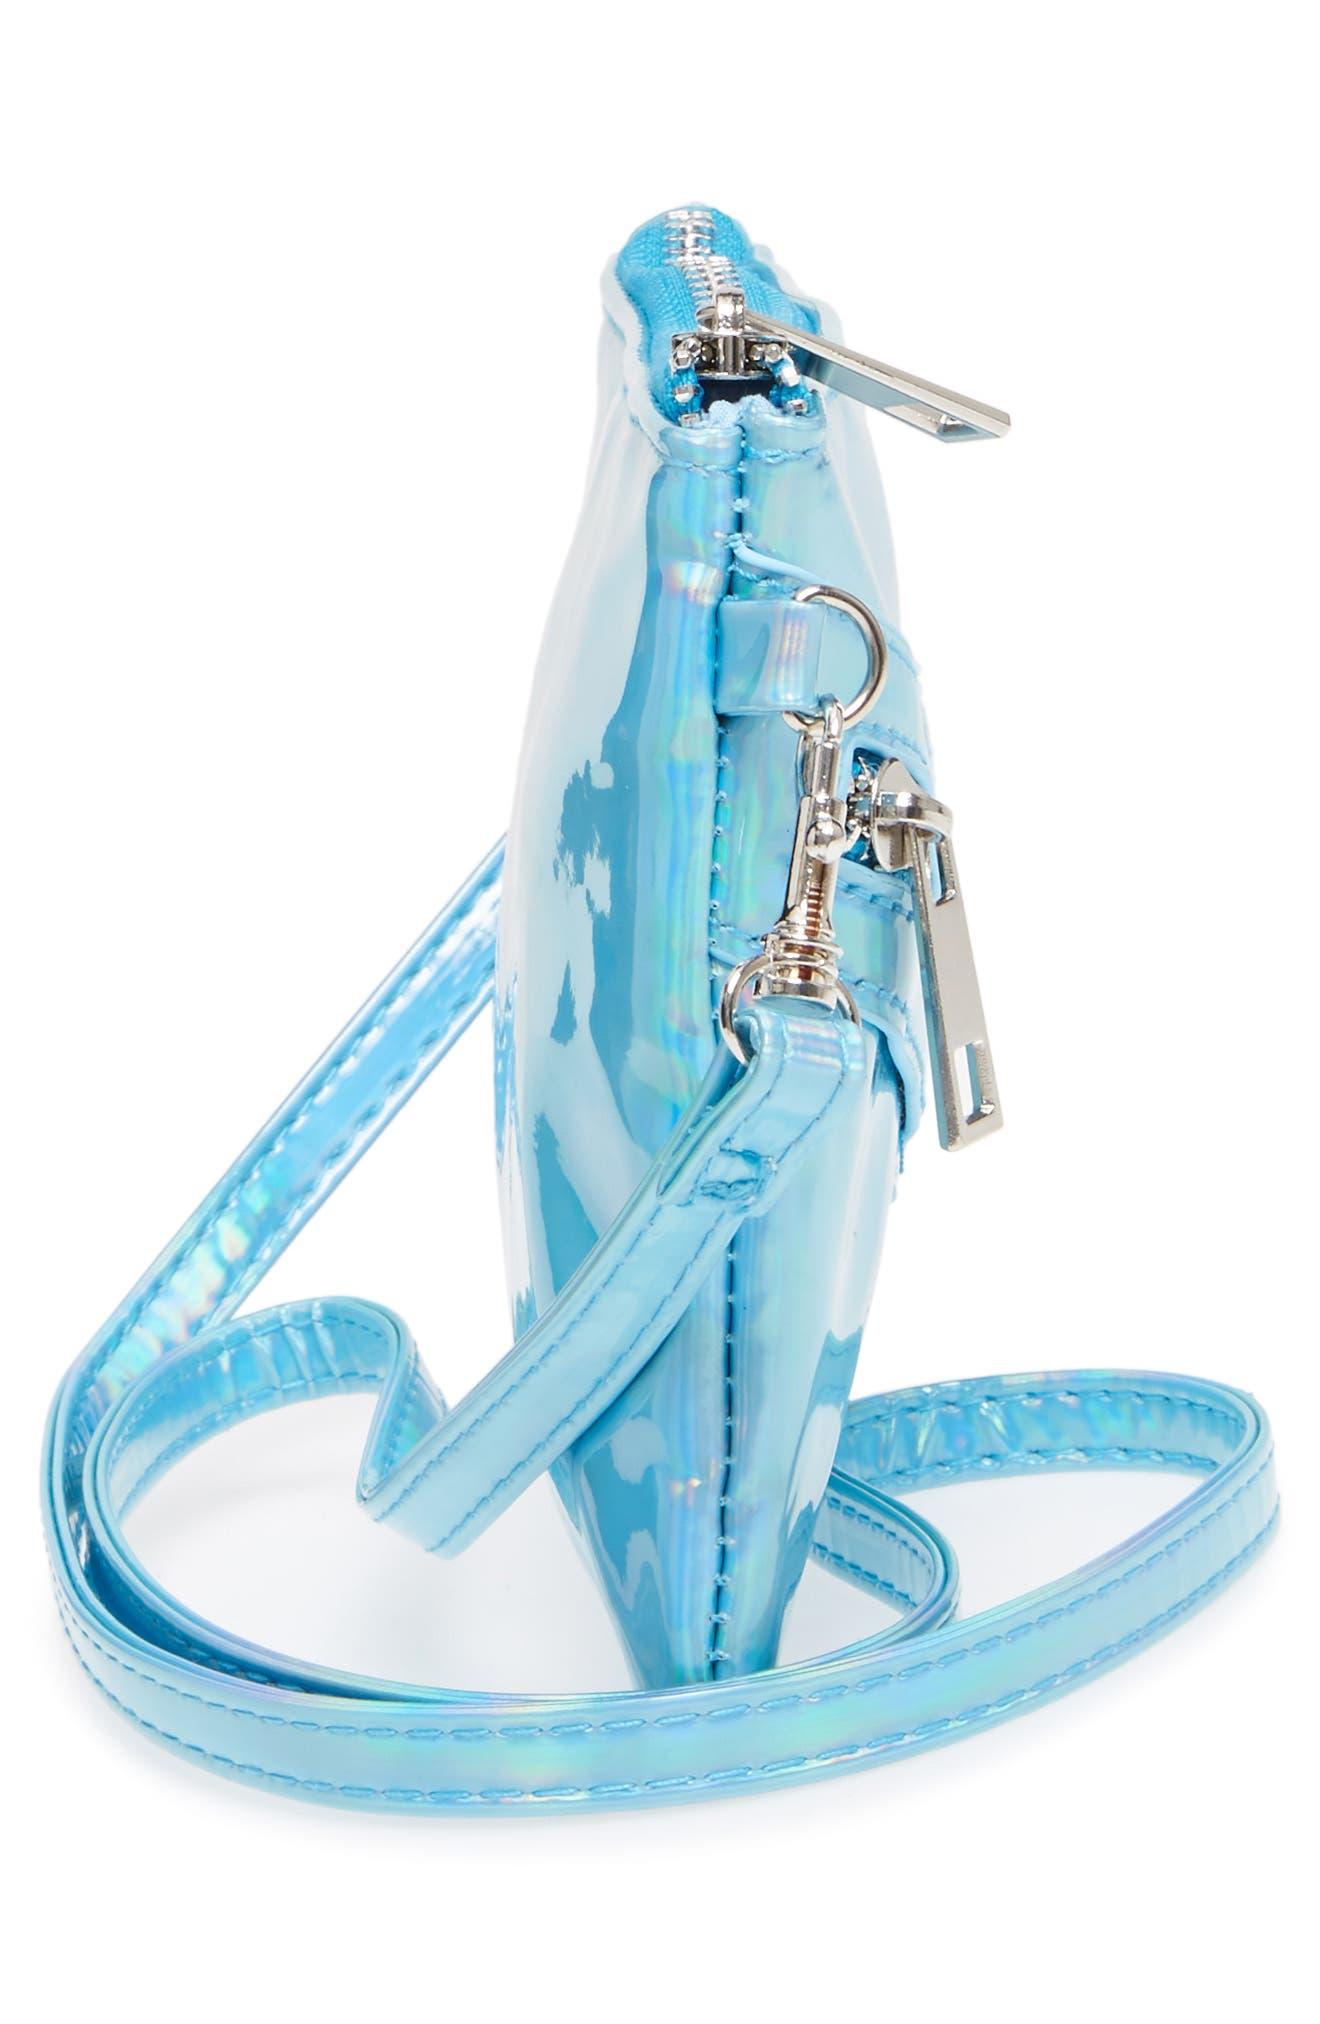 Capelli of New York Hologram Crossbody Bag,                             Alternate thumbnail 4, color,                             401